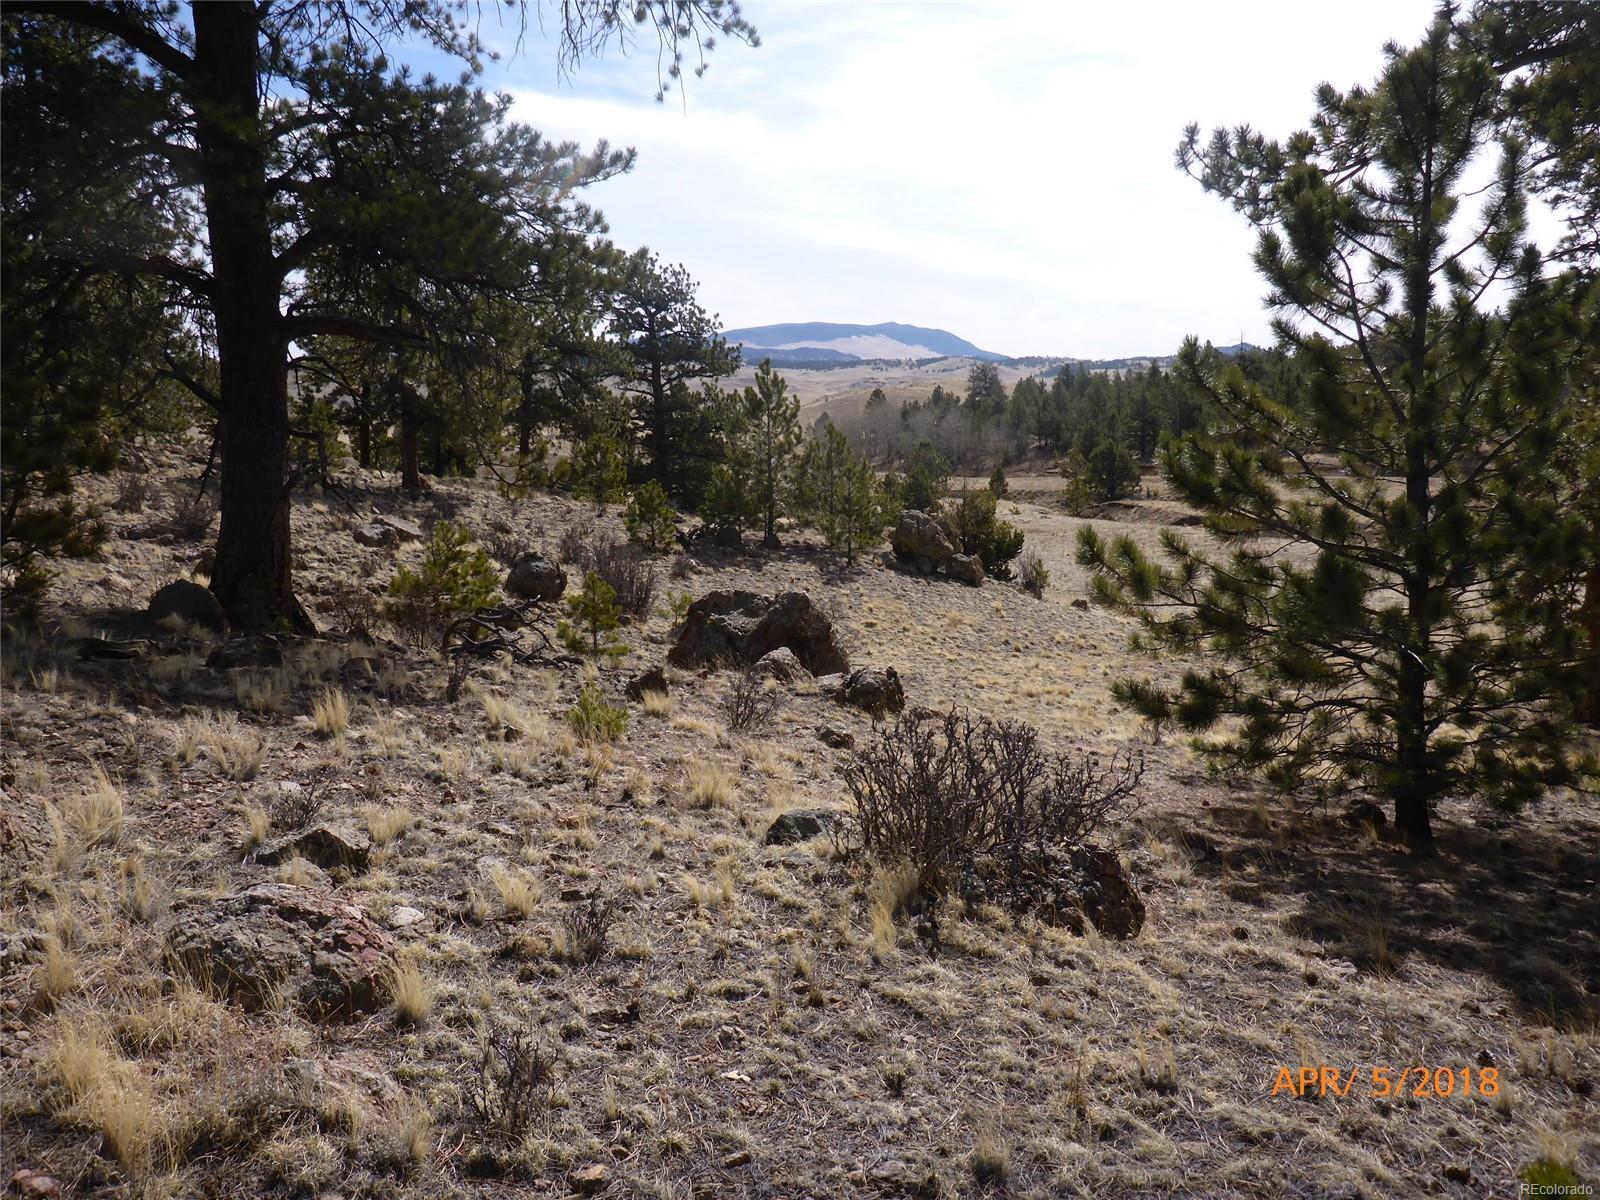 000 Isadowa Trail, Hartsel, CO 80449 - Hartsel, CO real estate listing